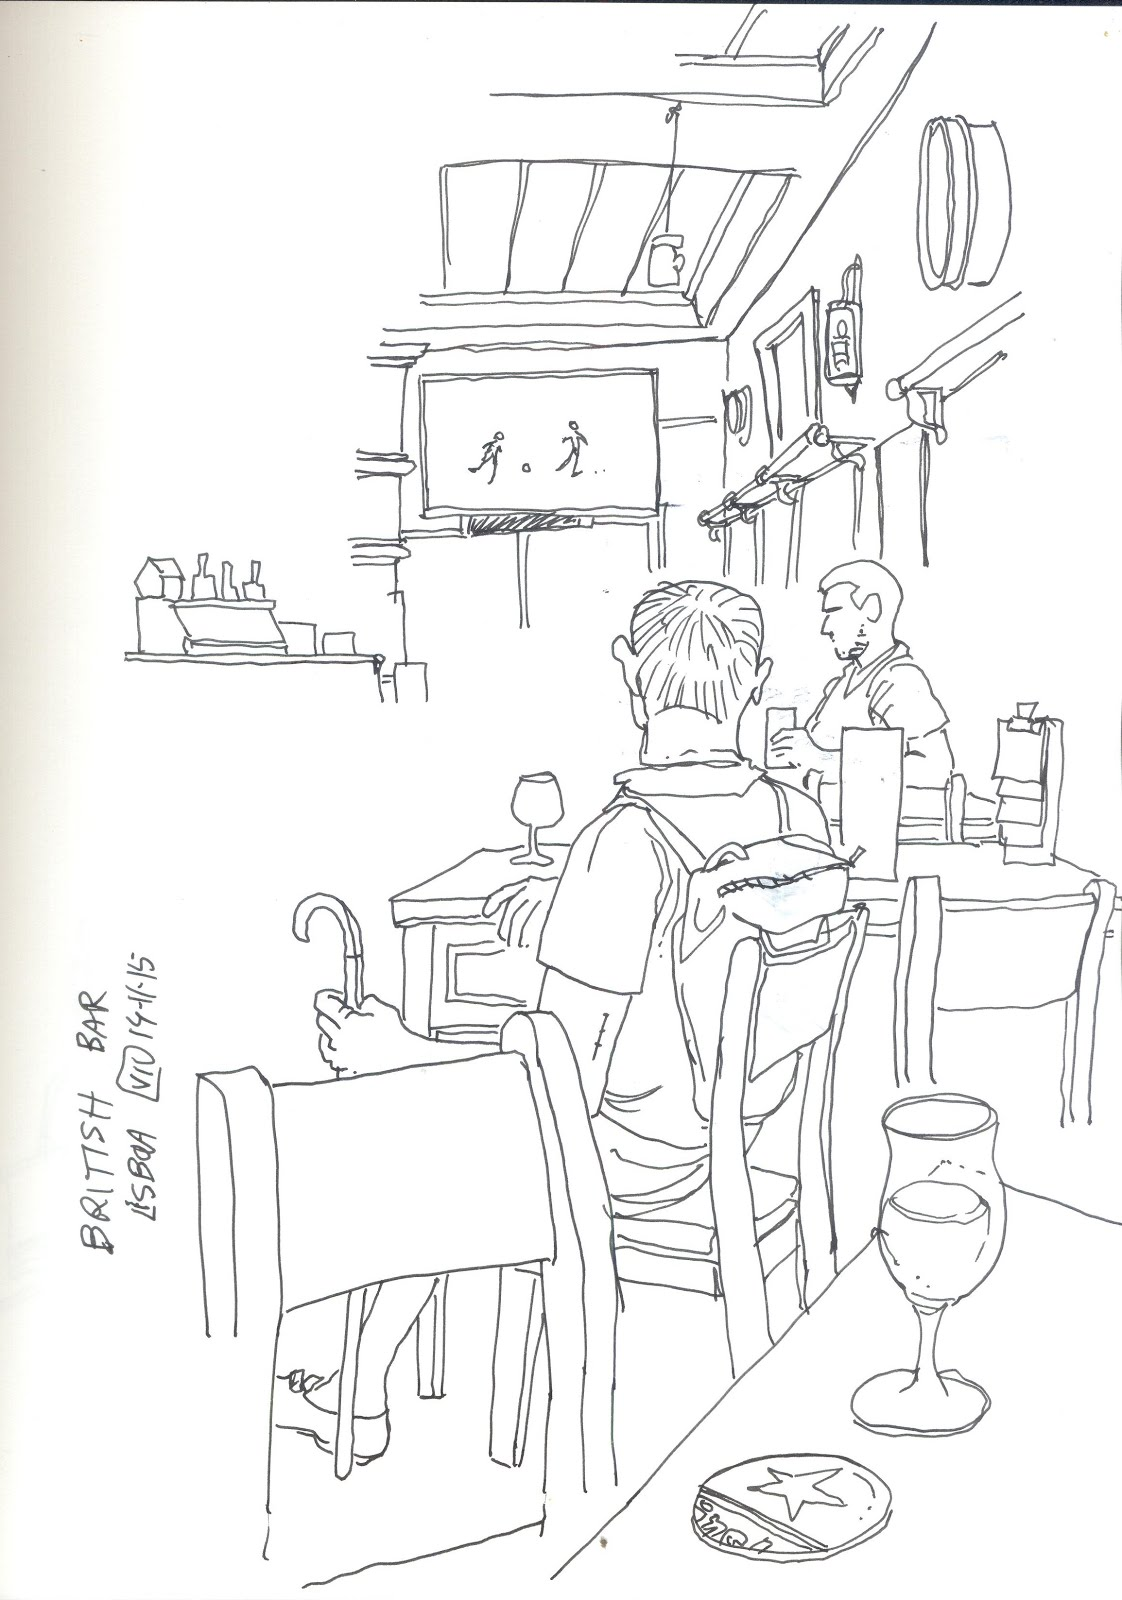 Activity 6: Pub Crawl: Draw If You Are Sober | Urban Sketchers